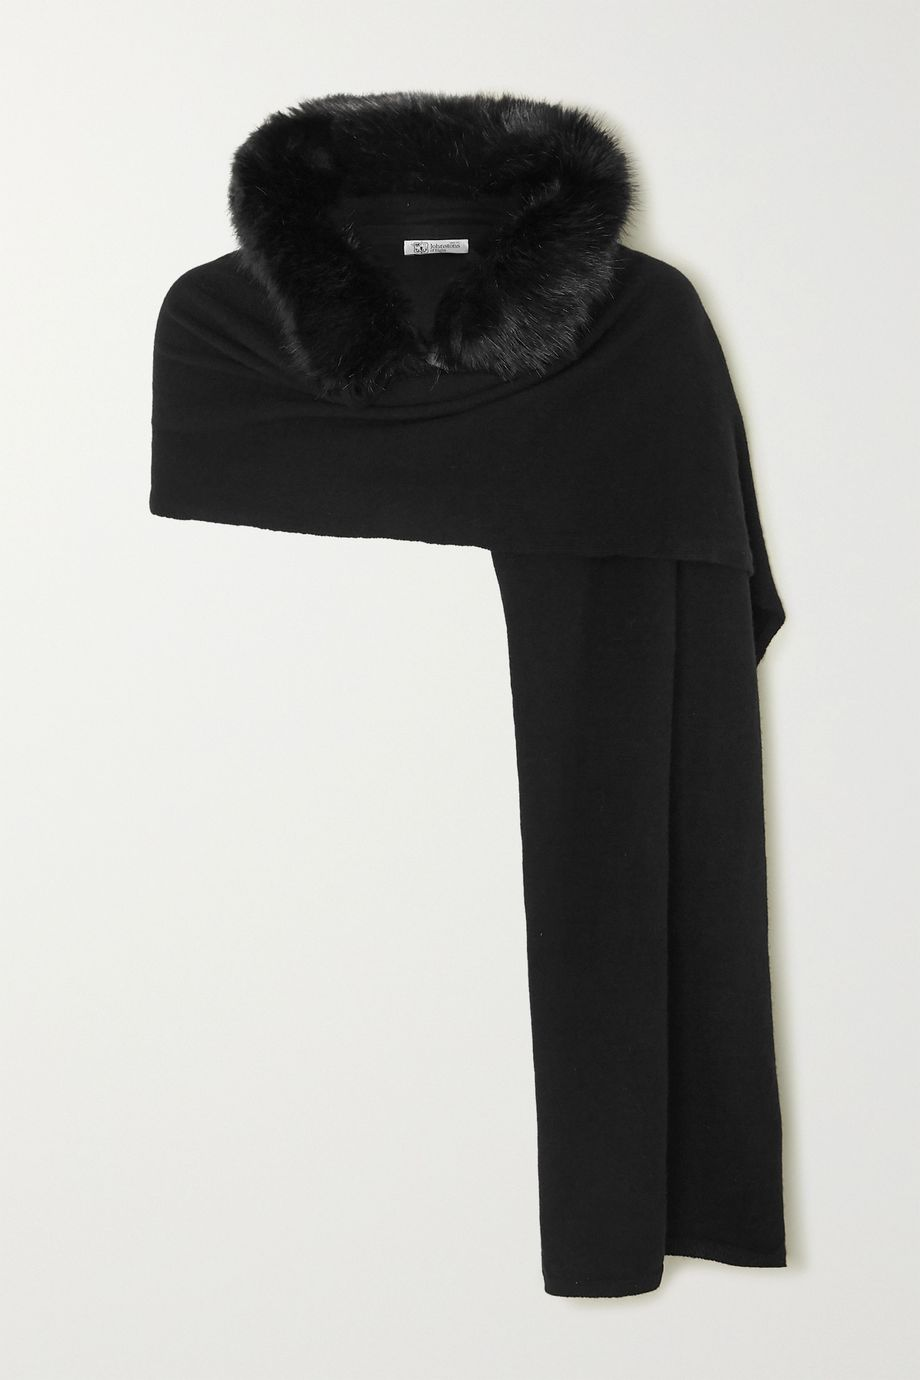 Johnstons of Elgin Hooded faux fur-trimmed cashmere scarf